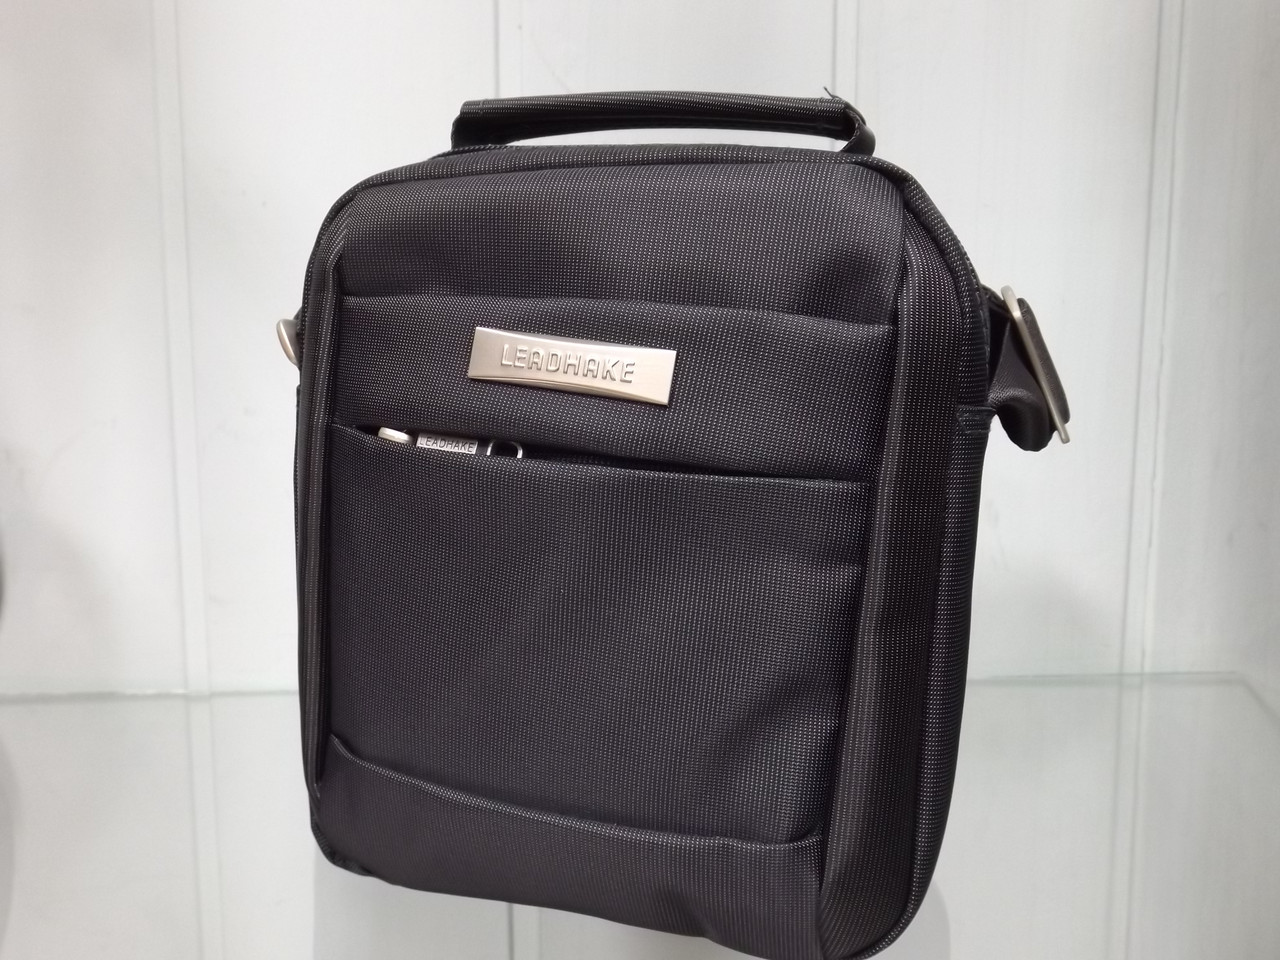 a2efb4789b1e Мужская текстильная сумка через плечо Leadhake 551 черная: продажа ...